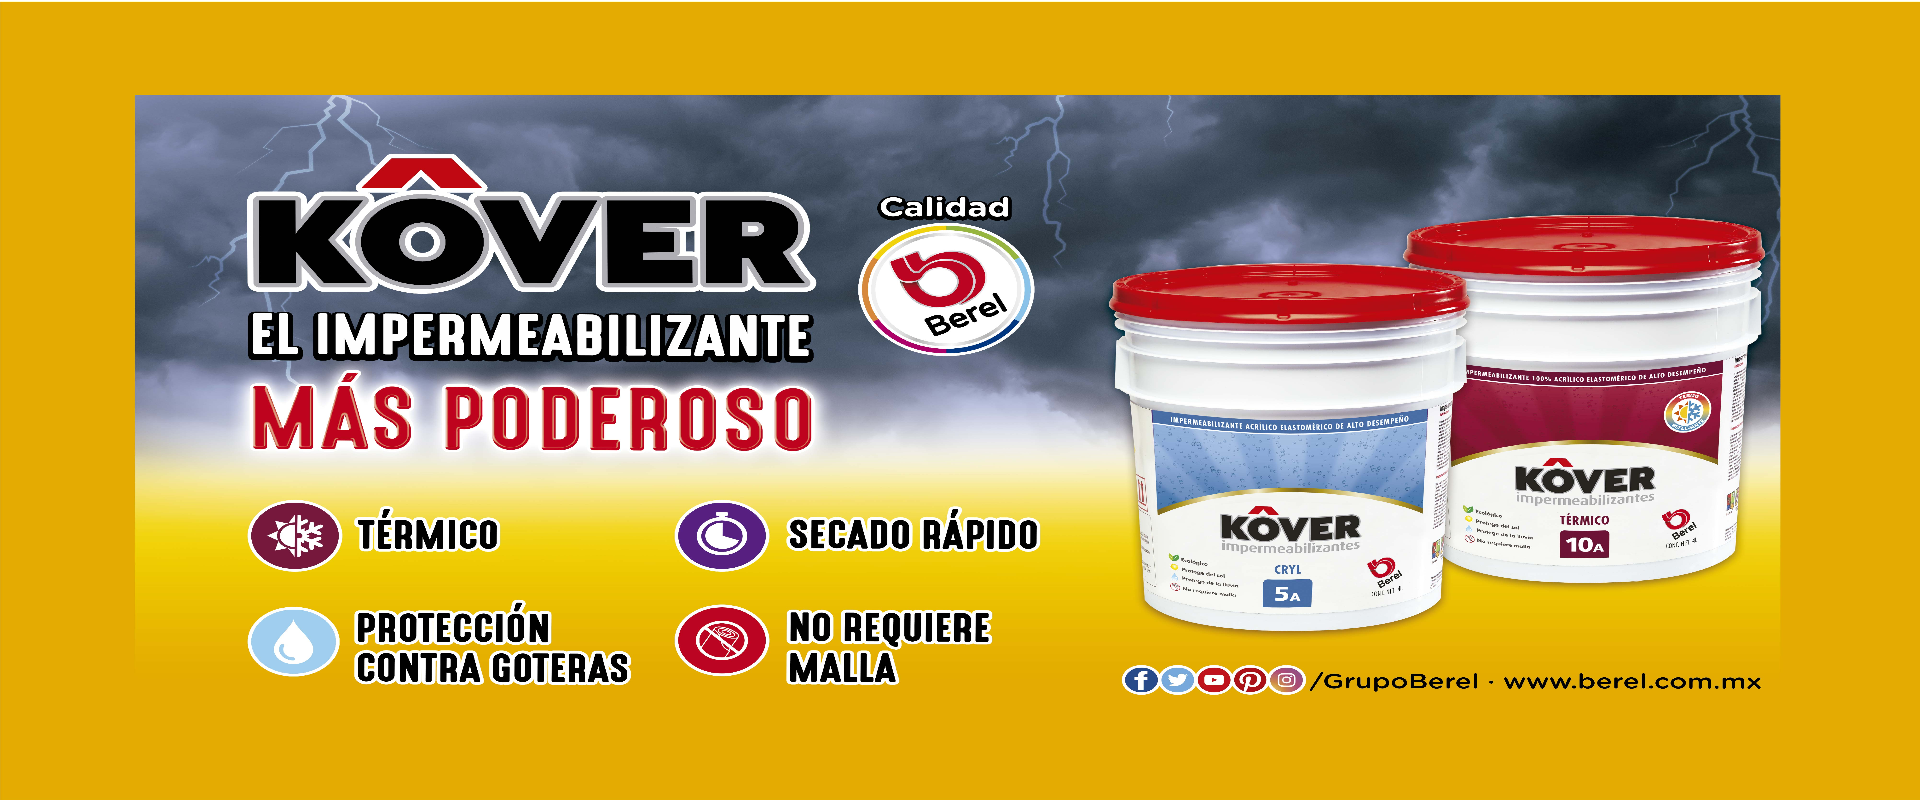 Credimart